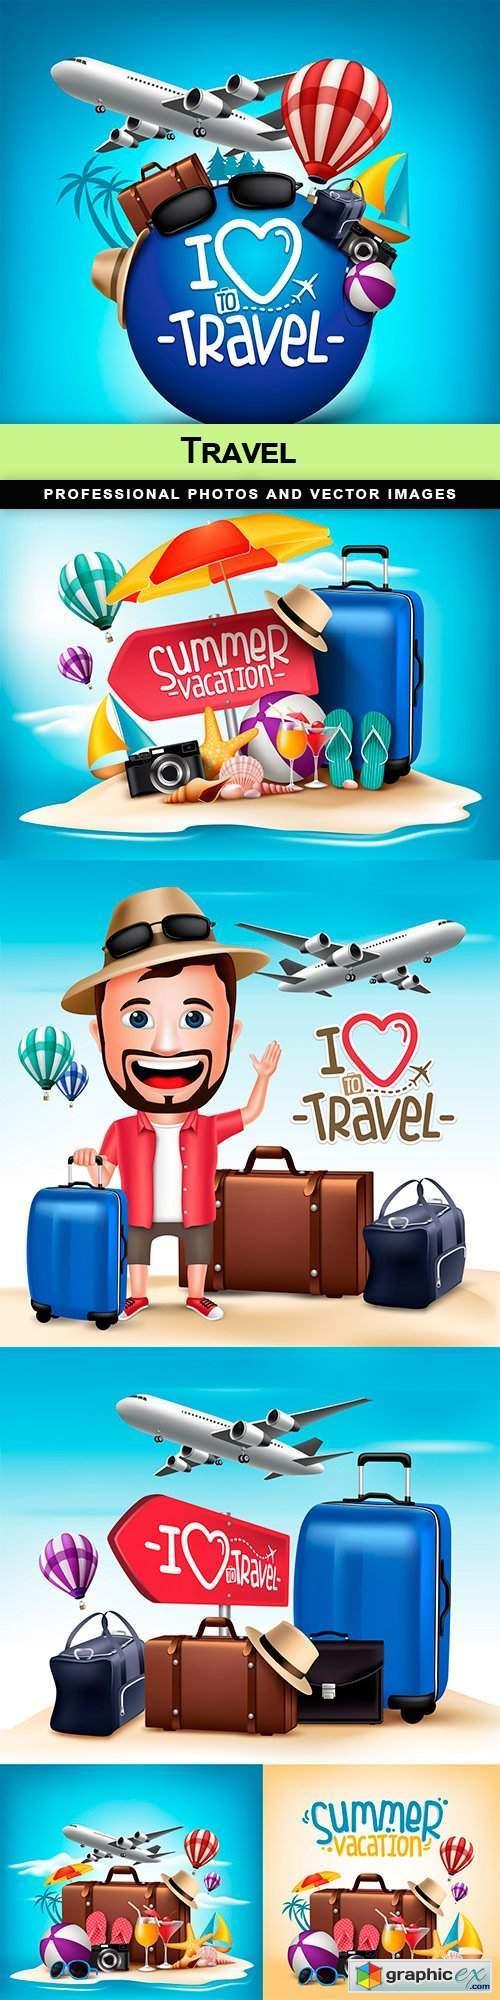 Travel - 6 EPS